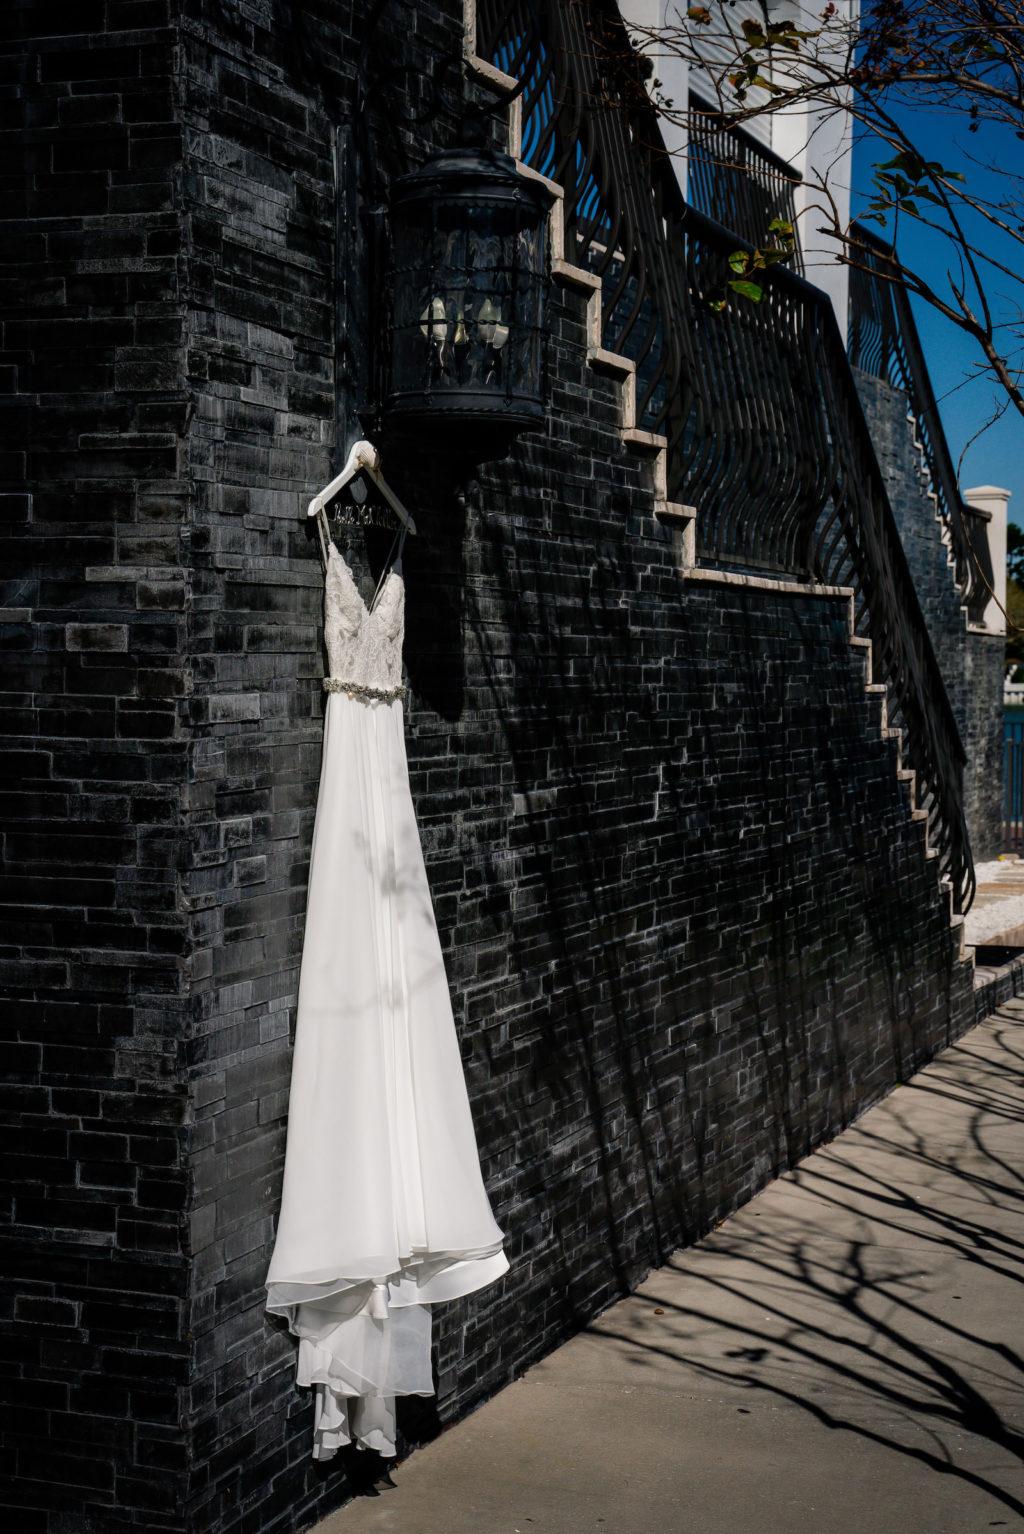 A-Line Spaghetti Strap Lace Bodice with Rhinestone Belt Alyne by Rita Vinieris Wedding Dress Hanging on Black Brick Wall | St. Pete Wedding Venue The Hotel Zamora | Wedding Dress Isabel O'Neil Bridal